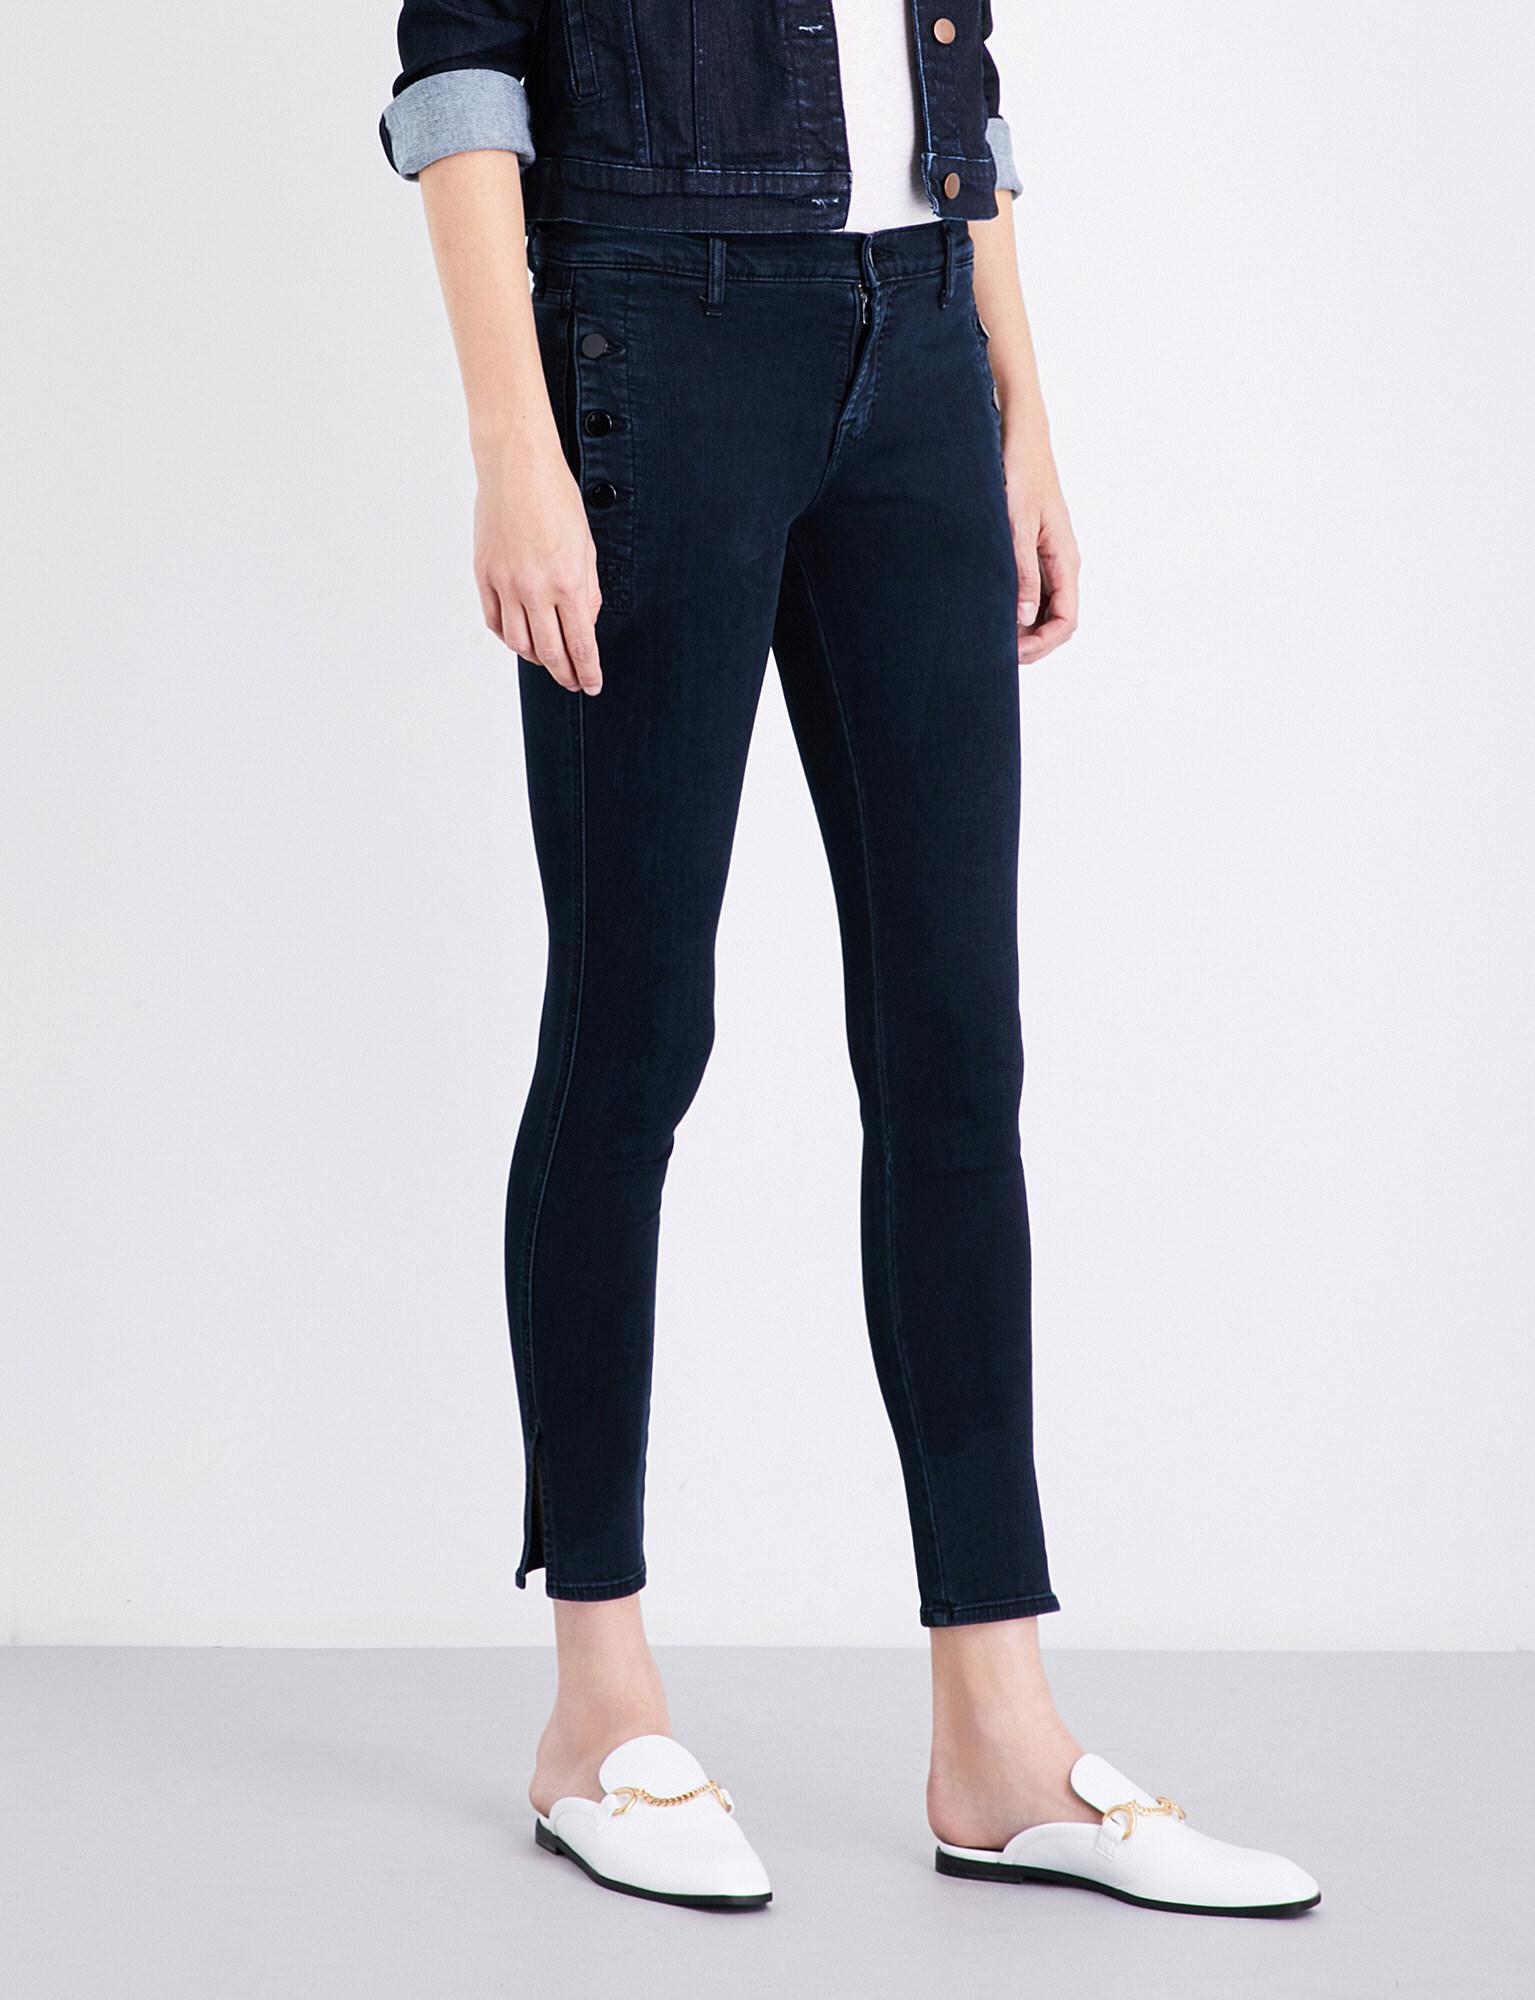 Womens Zion Mid-Rise Skinny Jeans J Brand iZ05sEhYJ